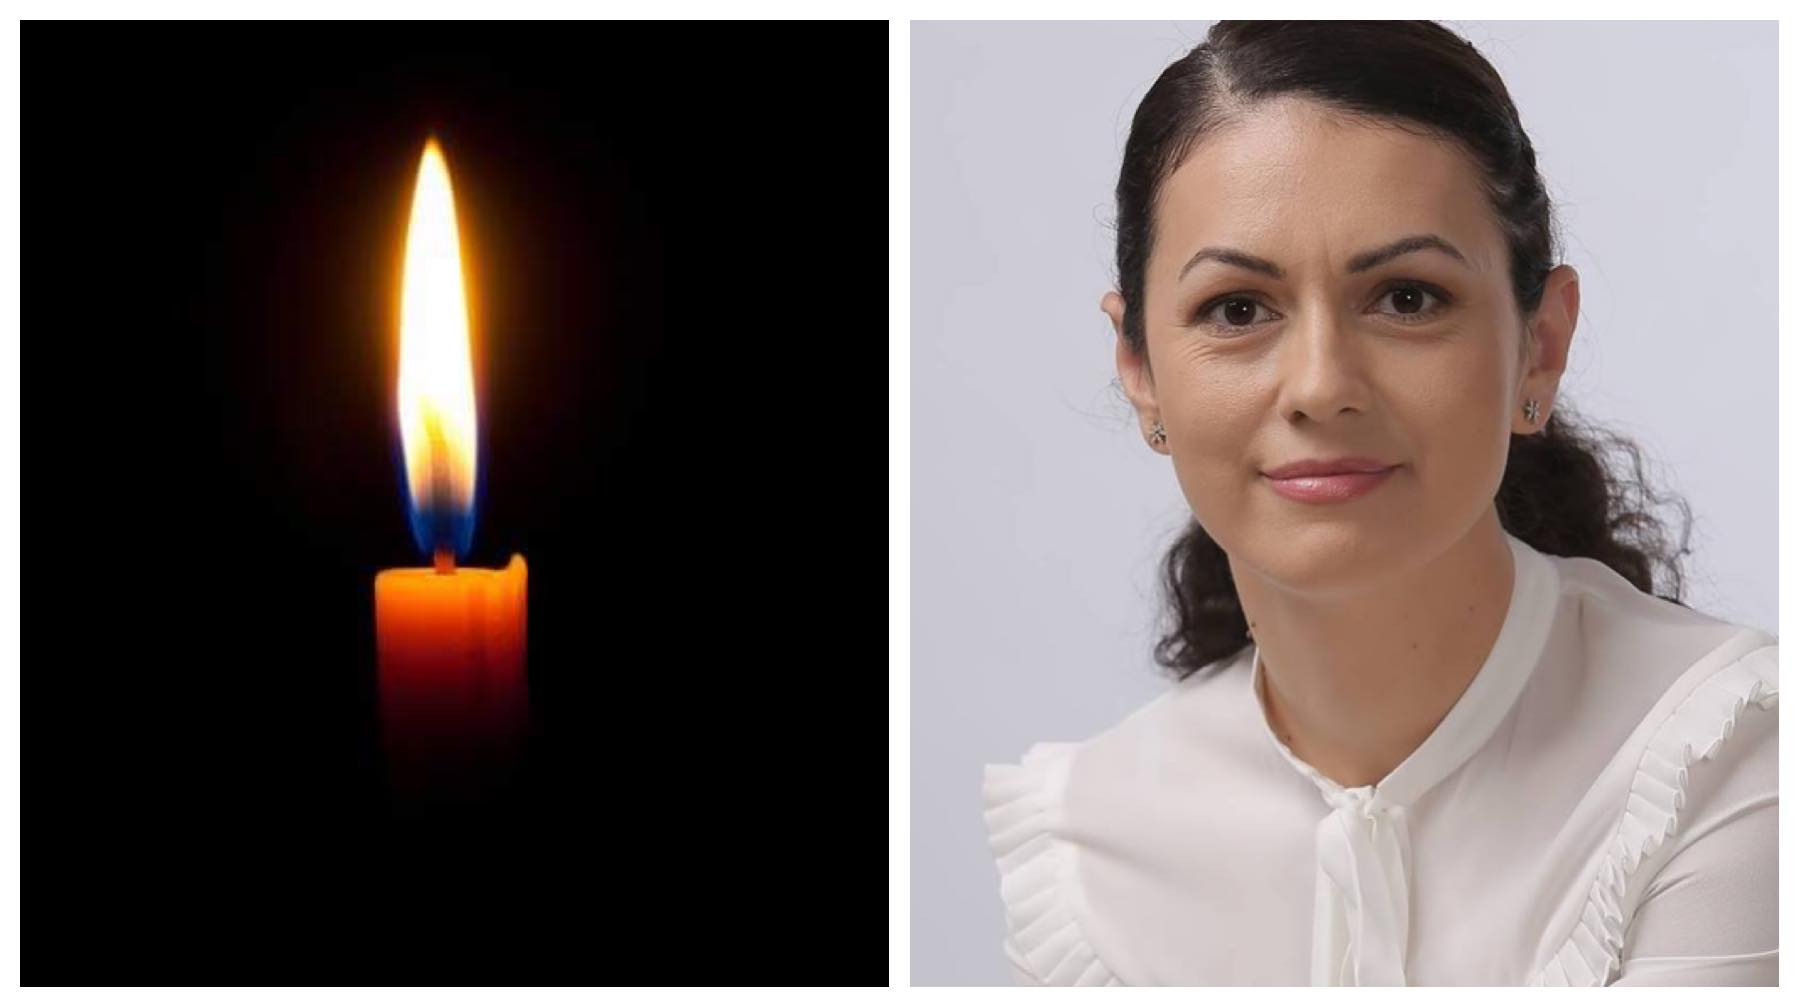 Fosta jurnalistă Iuliana Roibu a murit - Cancan.ro